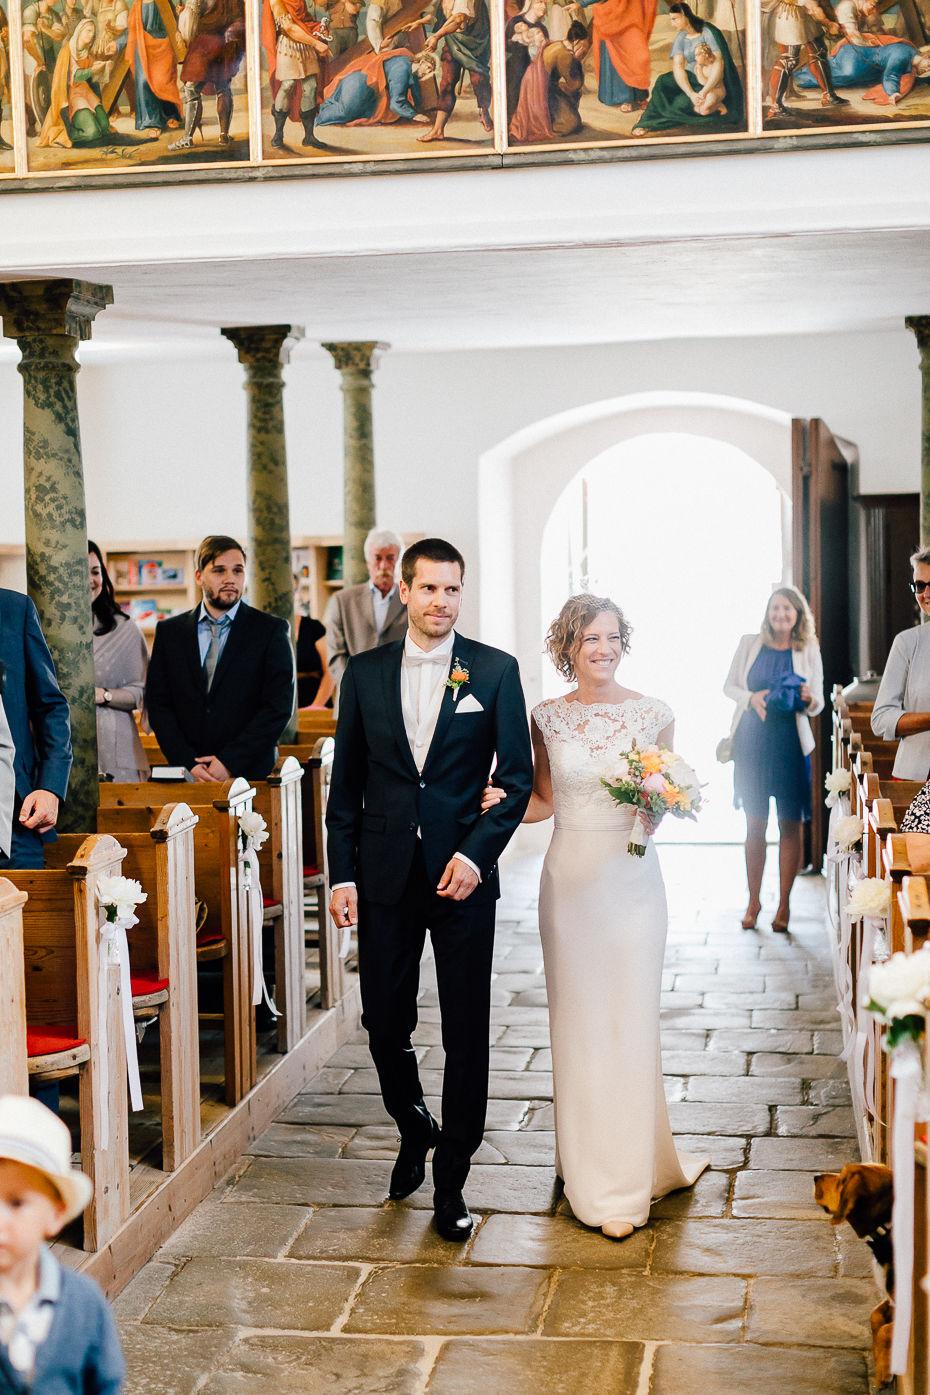 Johanna+Michael - JM-Hochzeit-Stift-Schlierbach-023.jpg